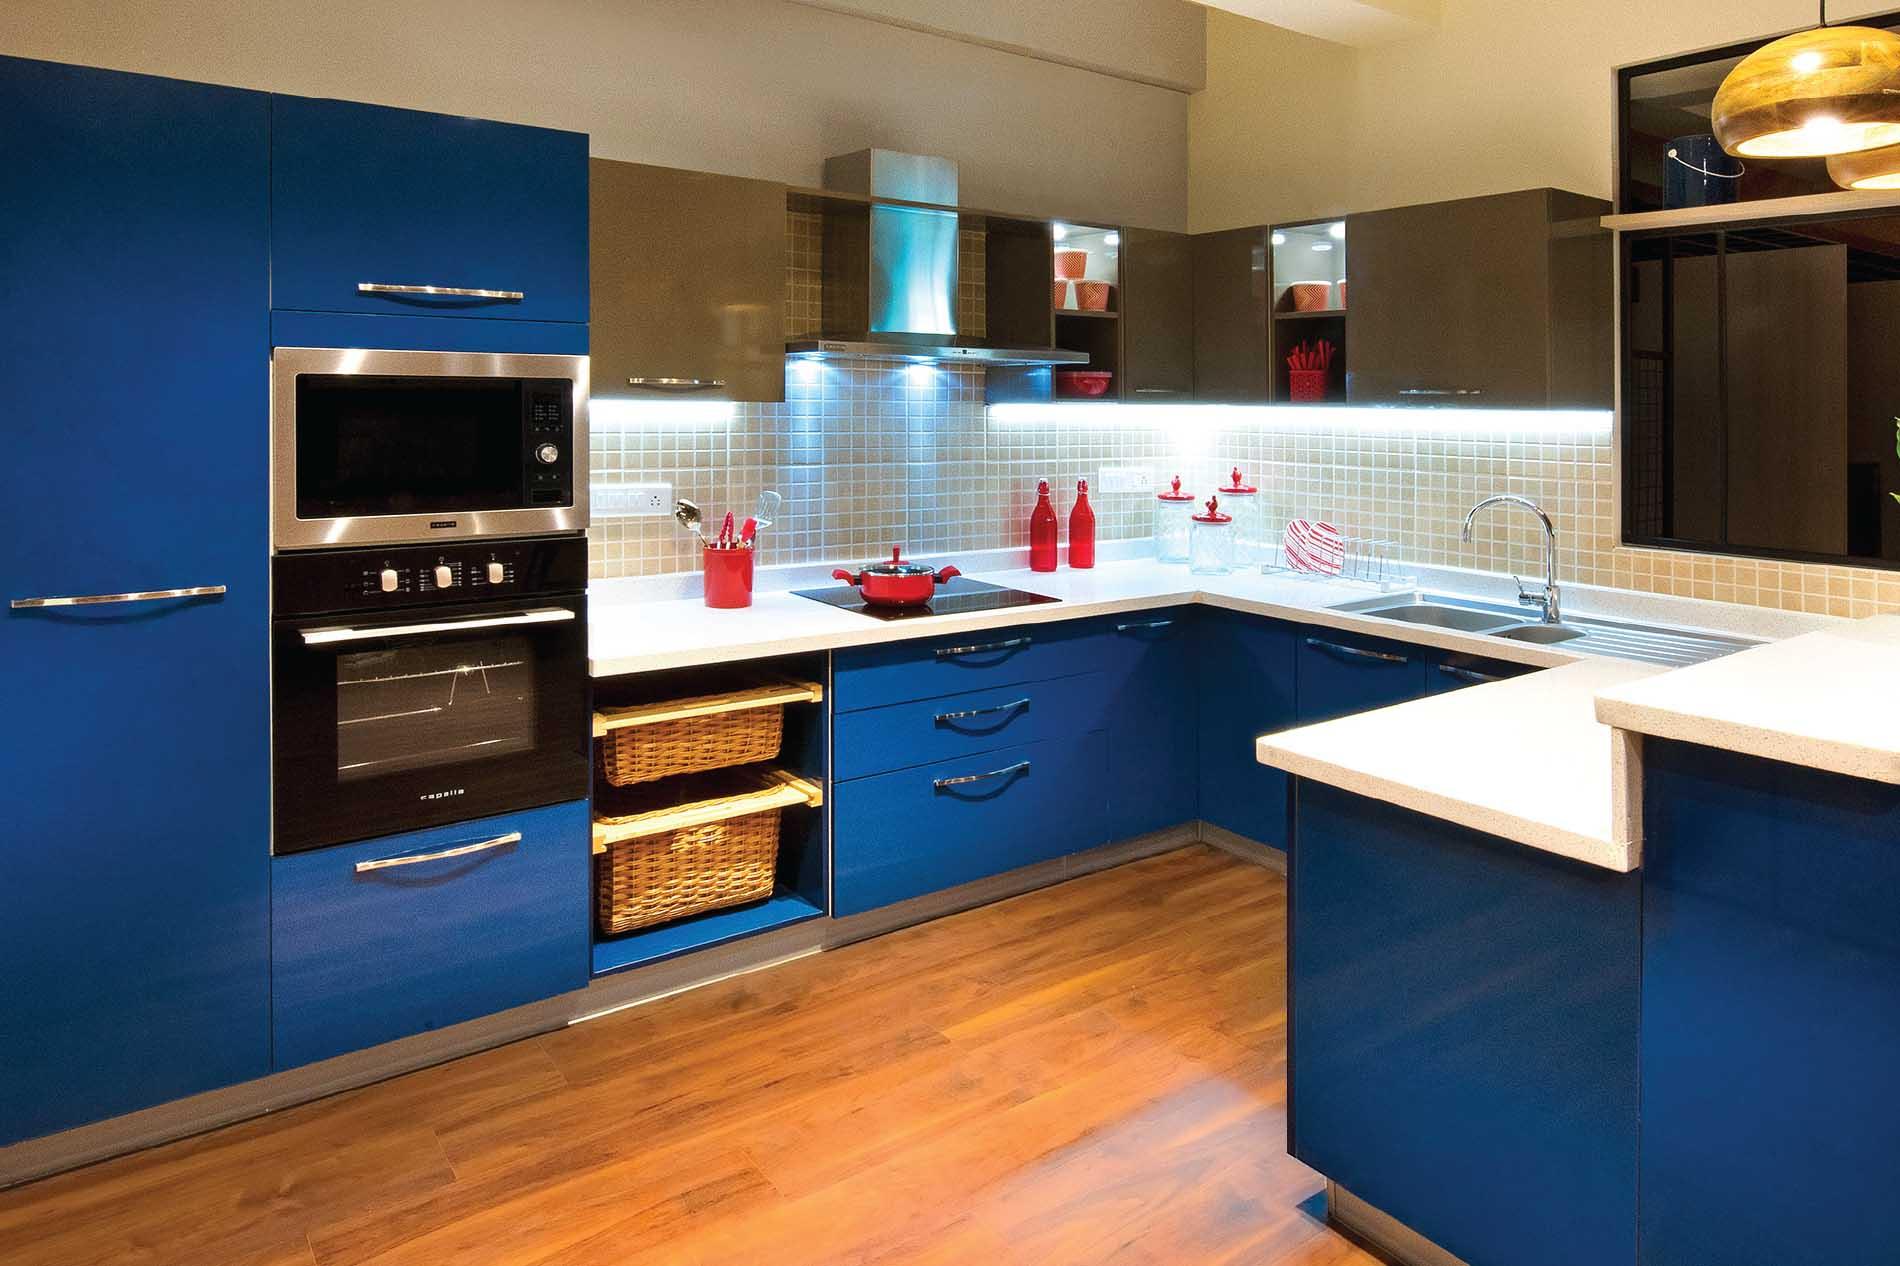 Interior Design For Home Full Home Interior Design Solutions In 45 Days Homelane